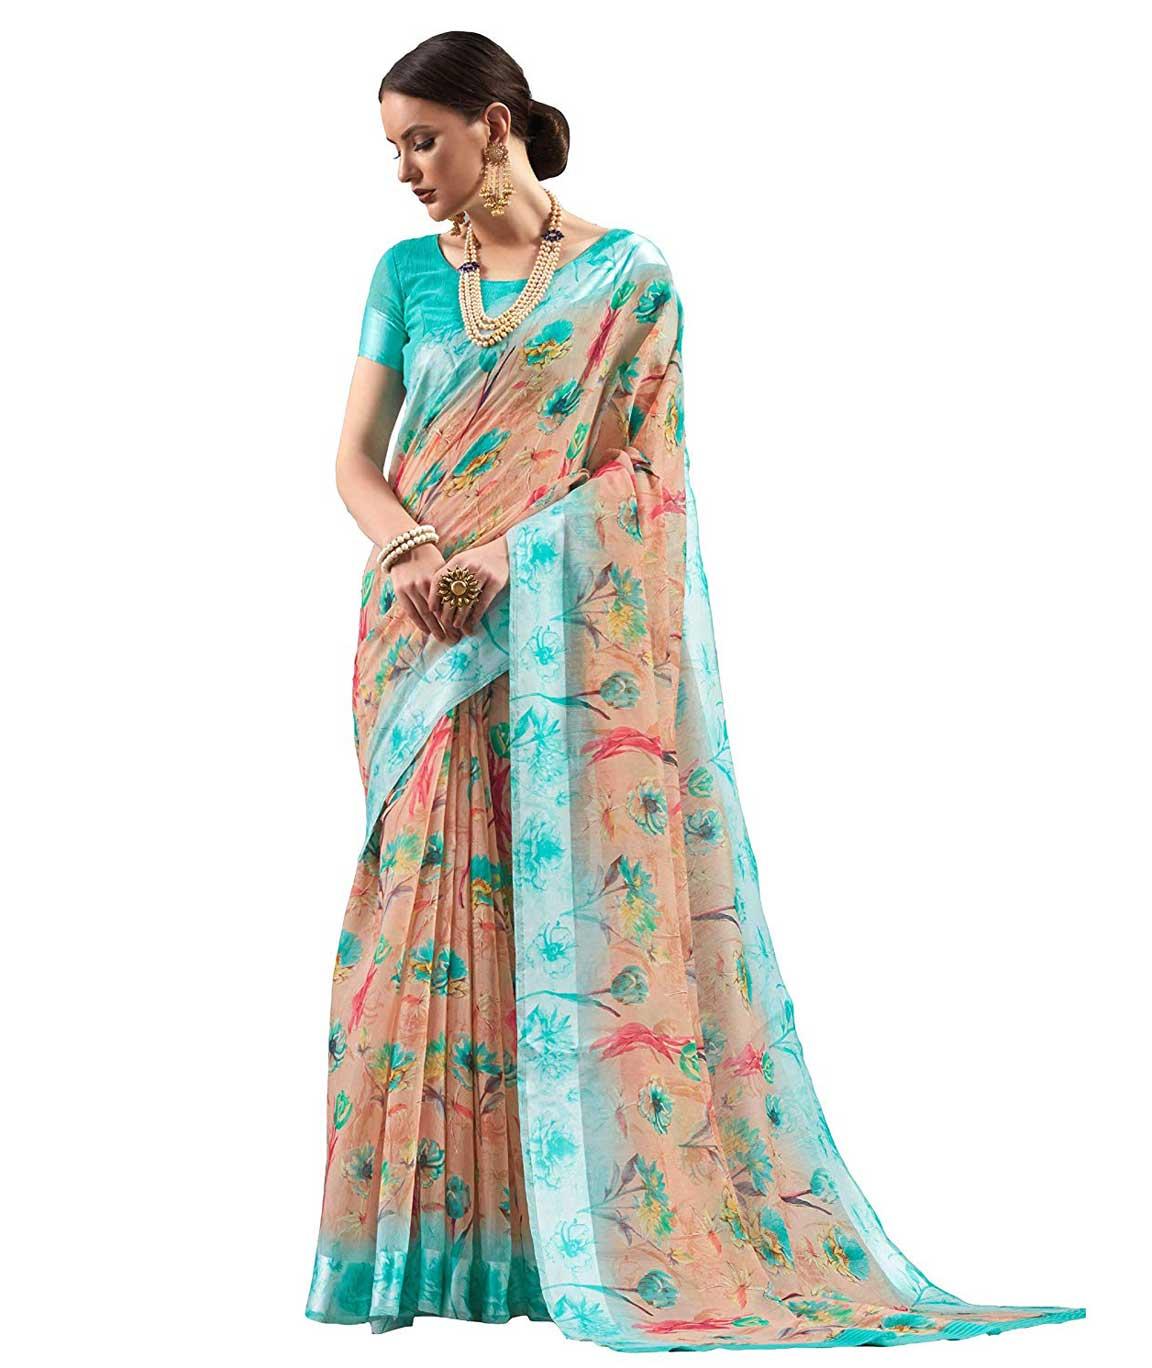 Shangrila Designer Women`s Digital Printed Linen Cotton Saree with Blouse (KNCHCTN13-4584 Sea Green Beige)